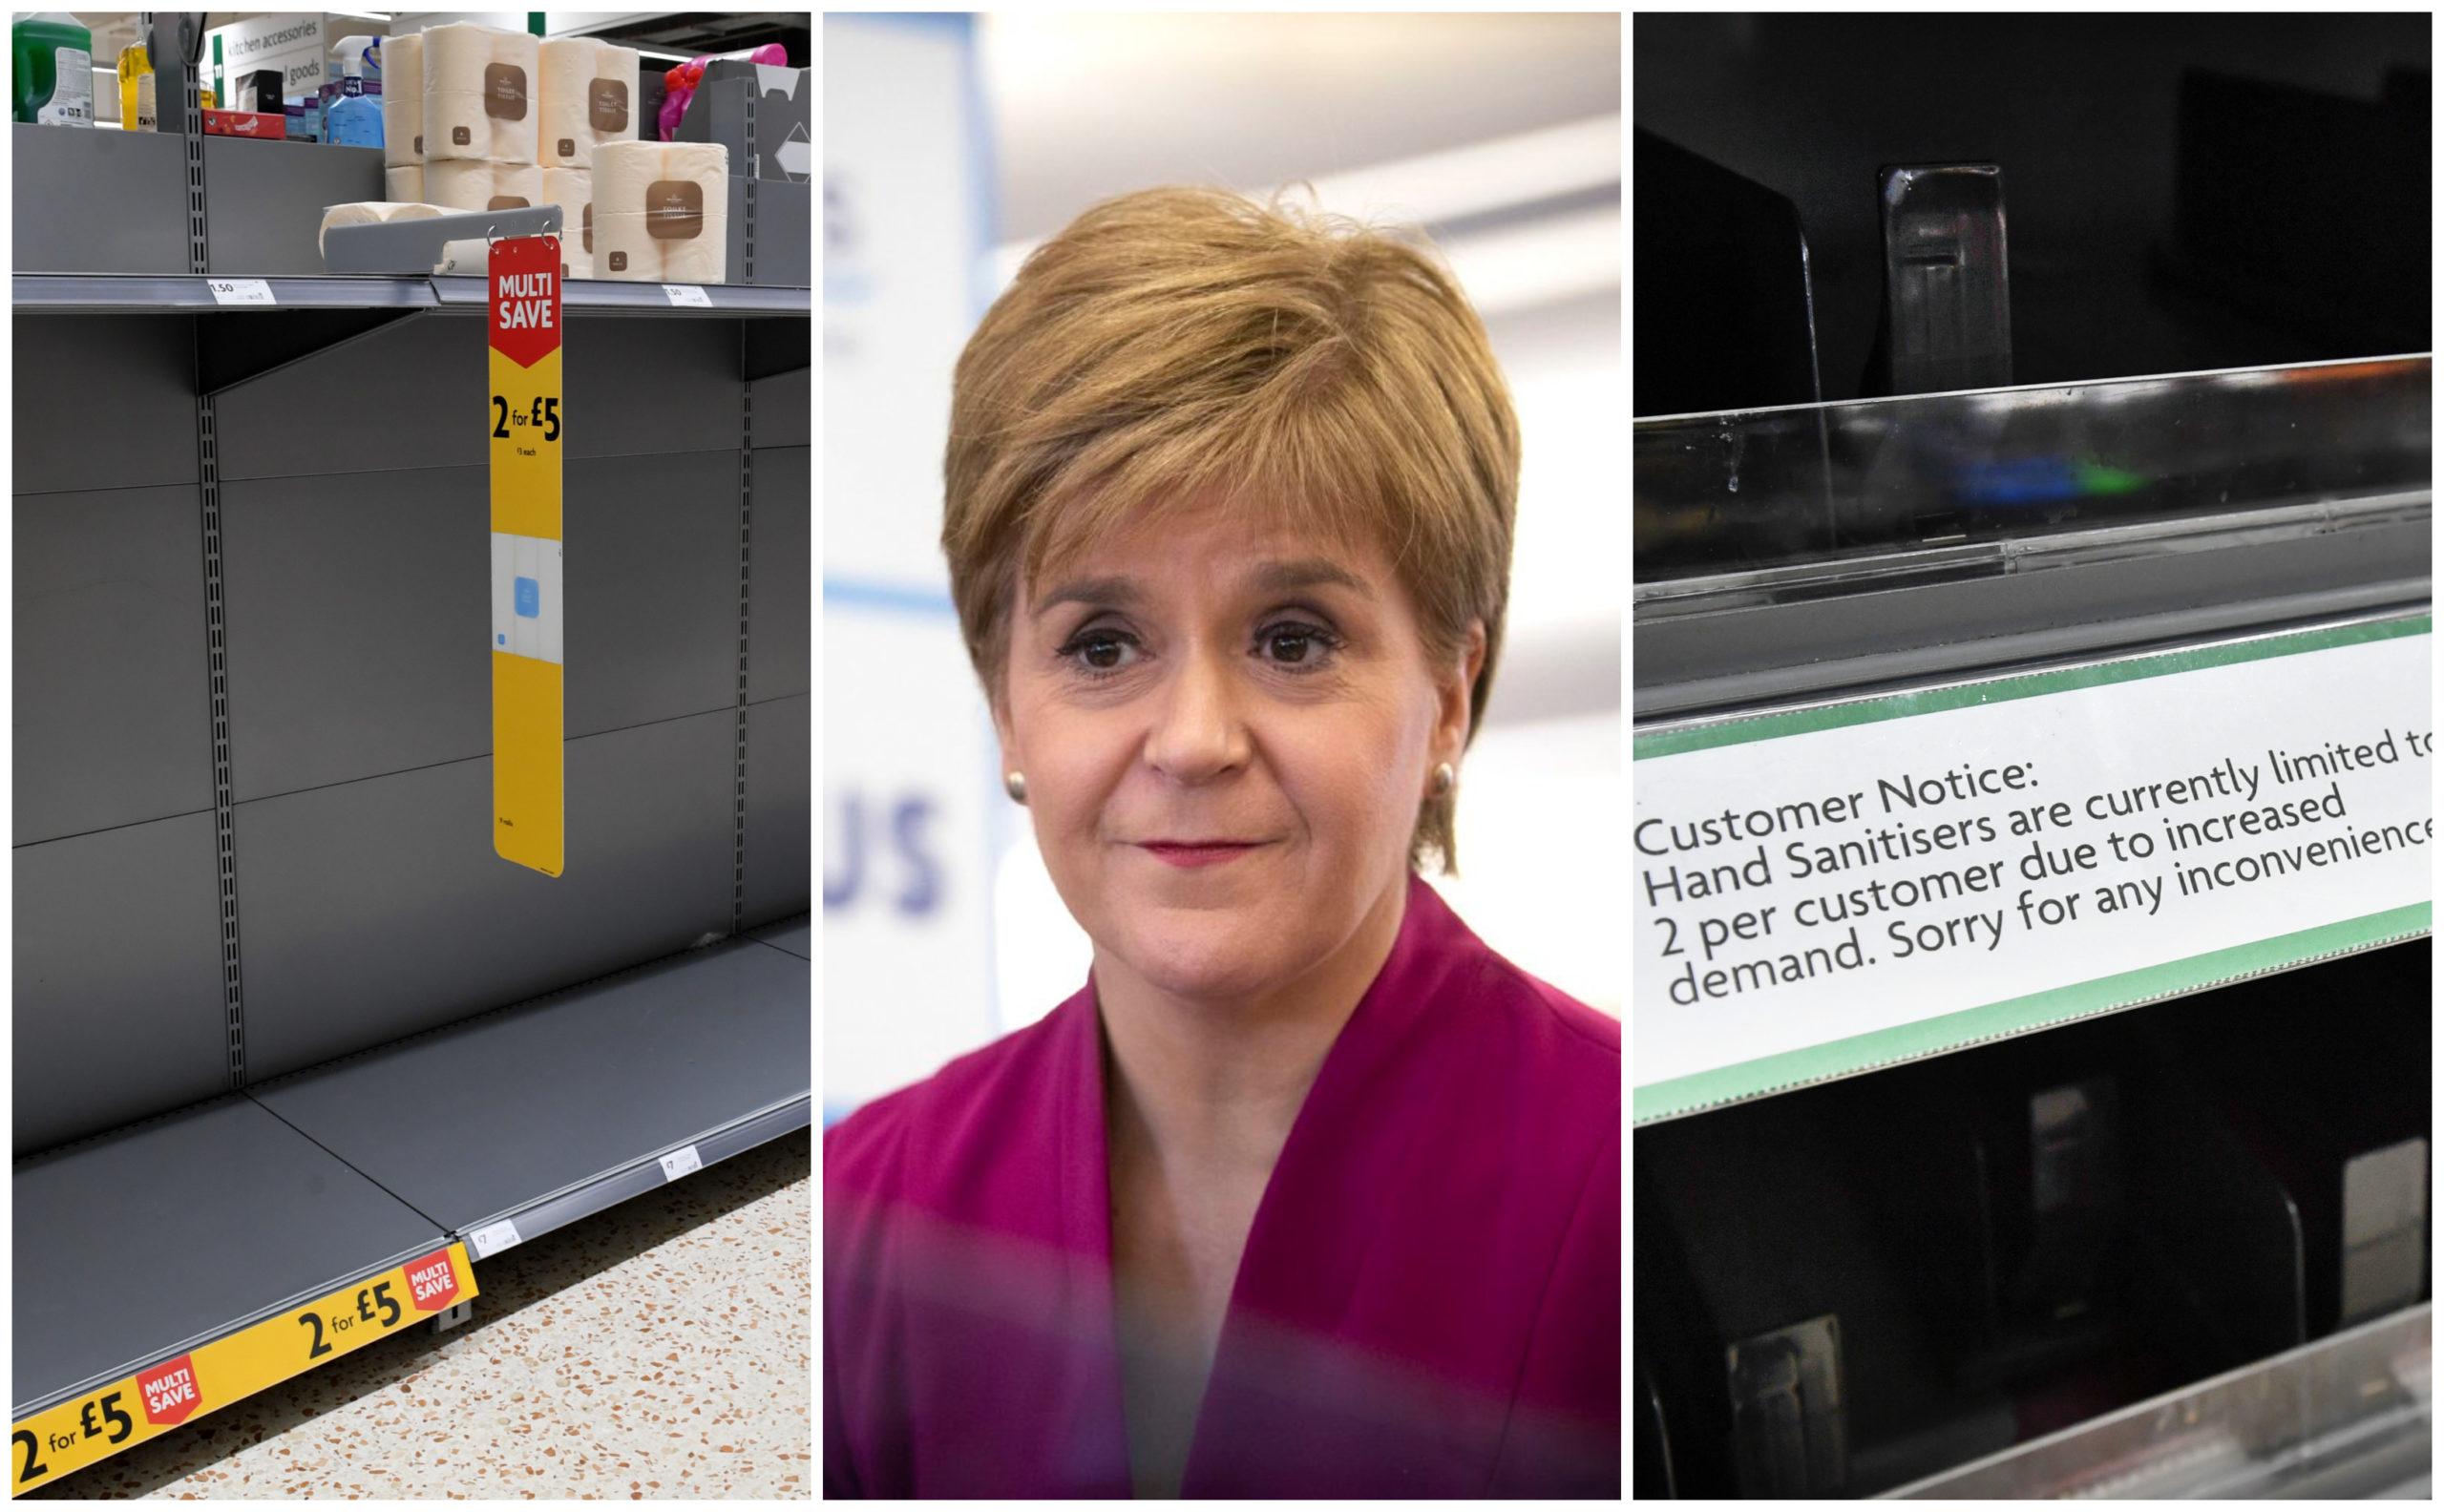 Nicola Sturgeon reacts to latest rise in coronavirus cases